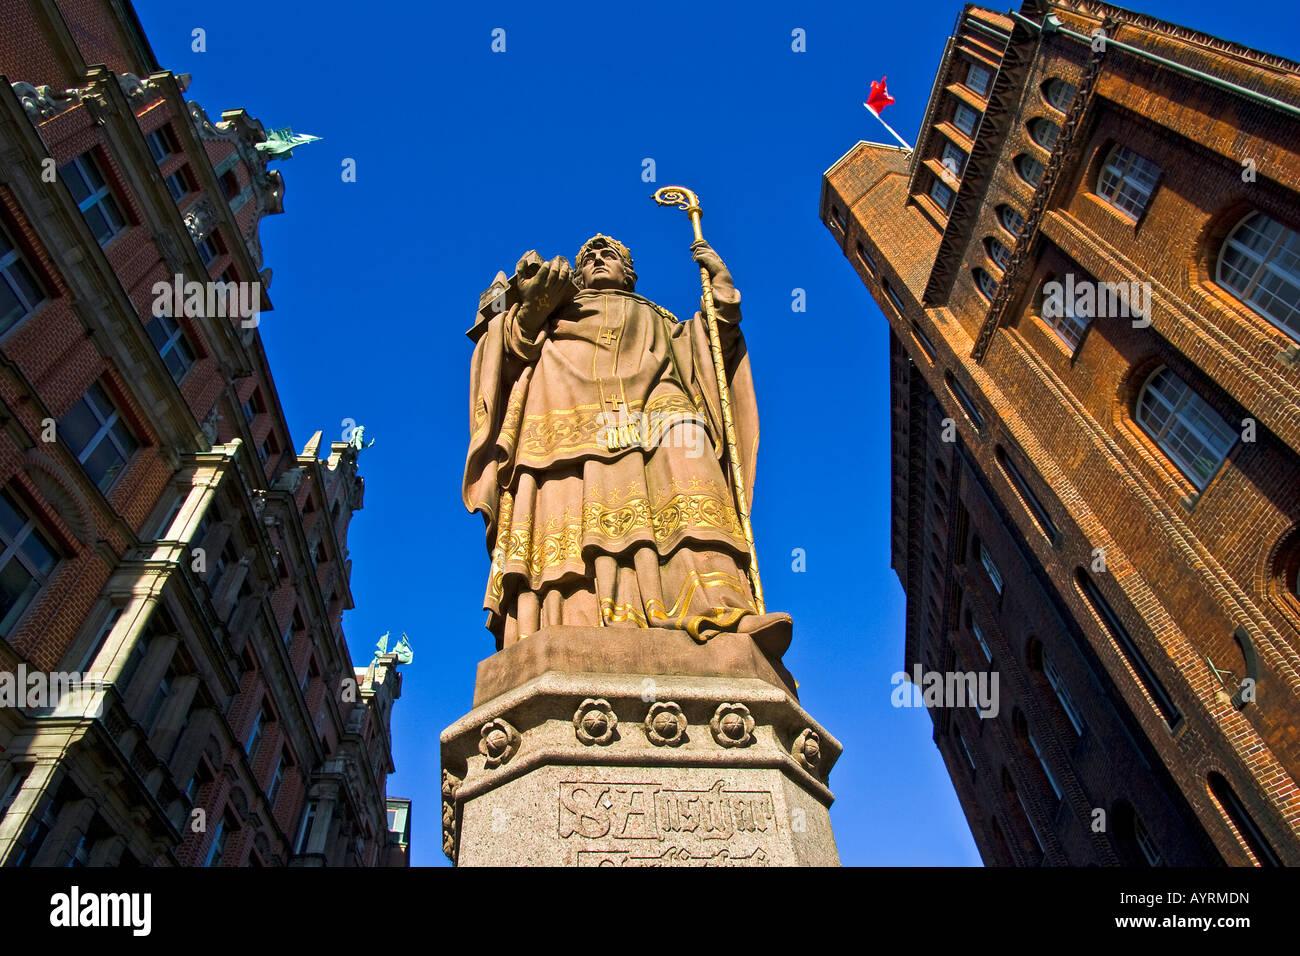 Statue of St. Ansgar on the Trostbruecke (Trost Bridge) in front of the historic Patriotischen Gesellschaft (right) - Stock Image